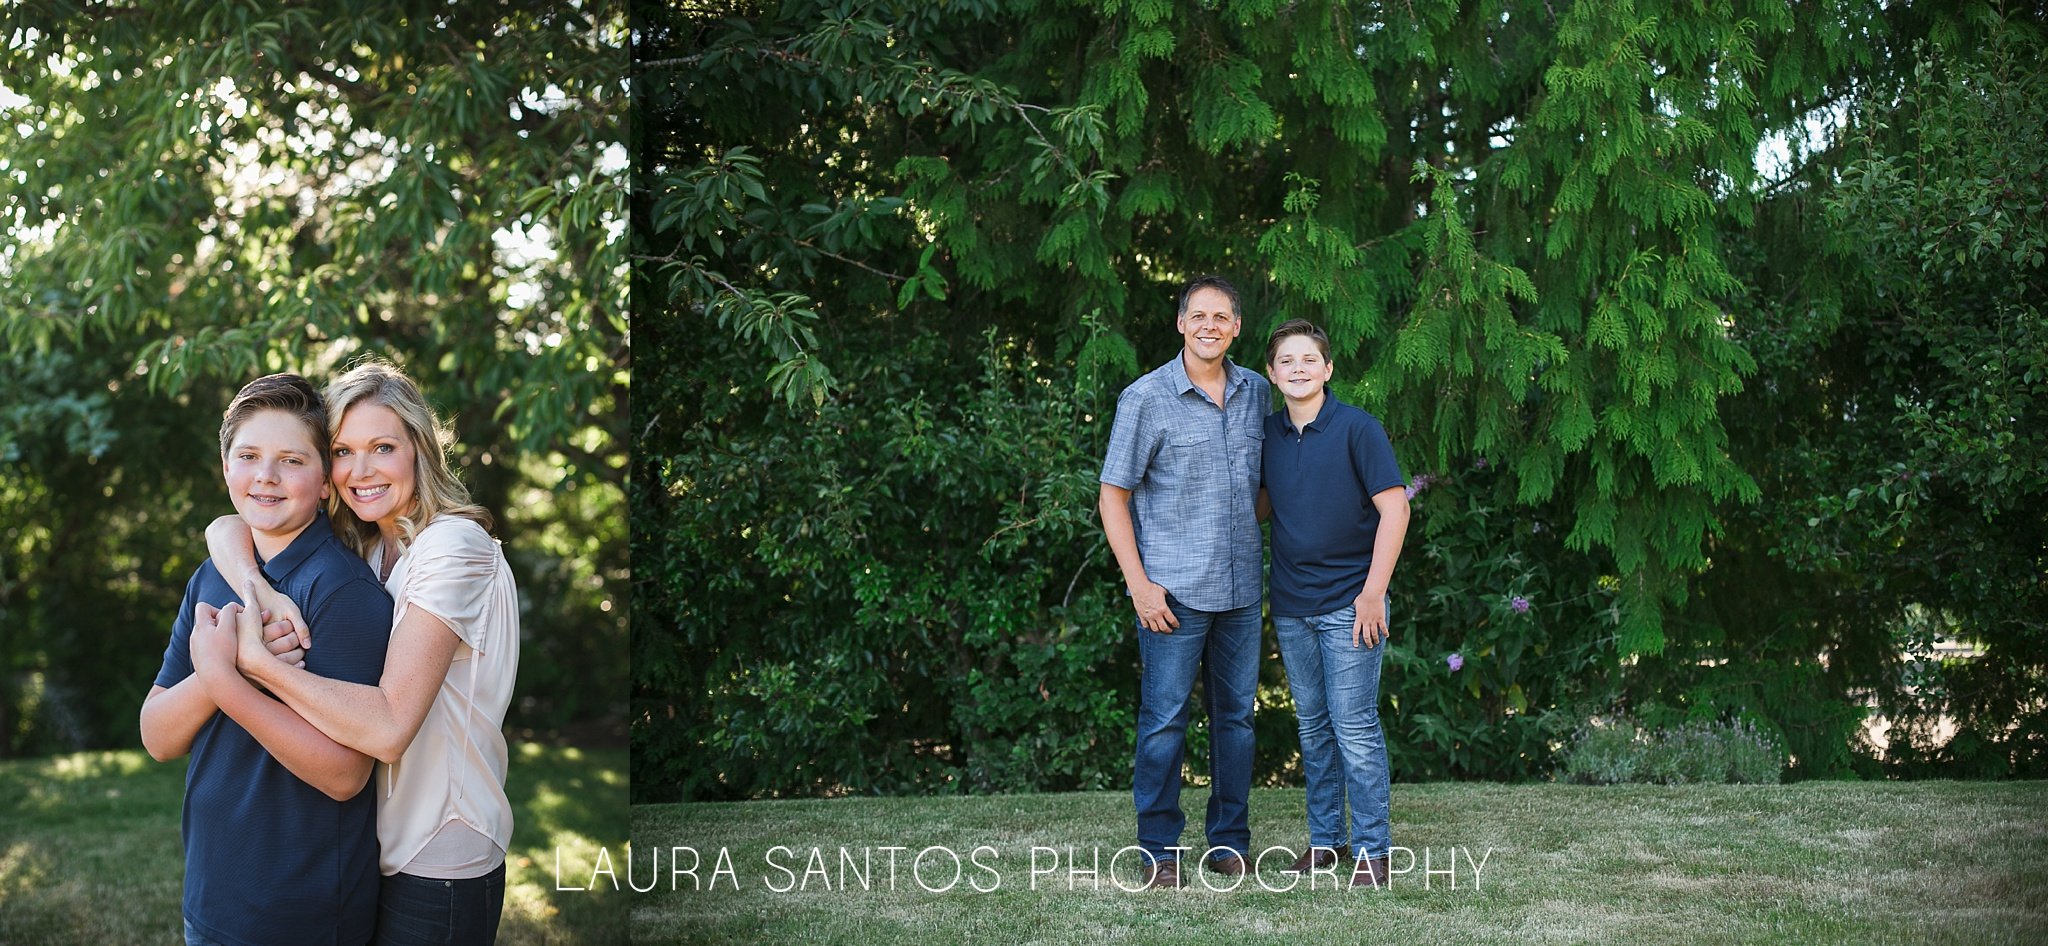 Laura Santos Photography Portland Oregon Family Photographer_0126.jpg